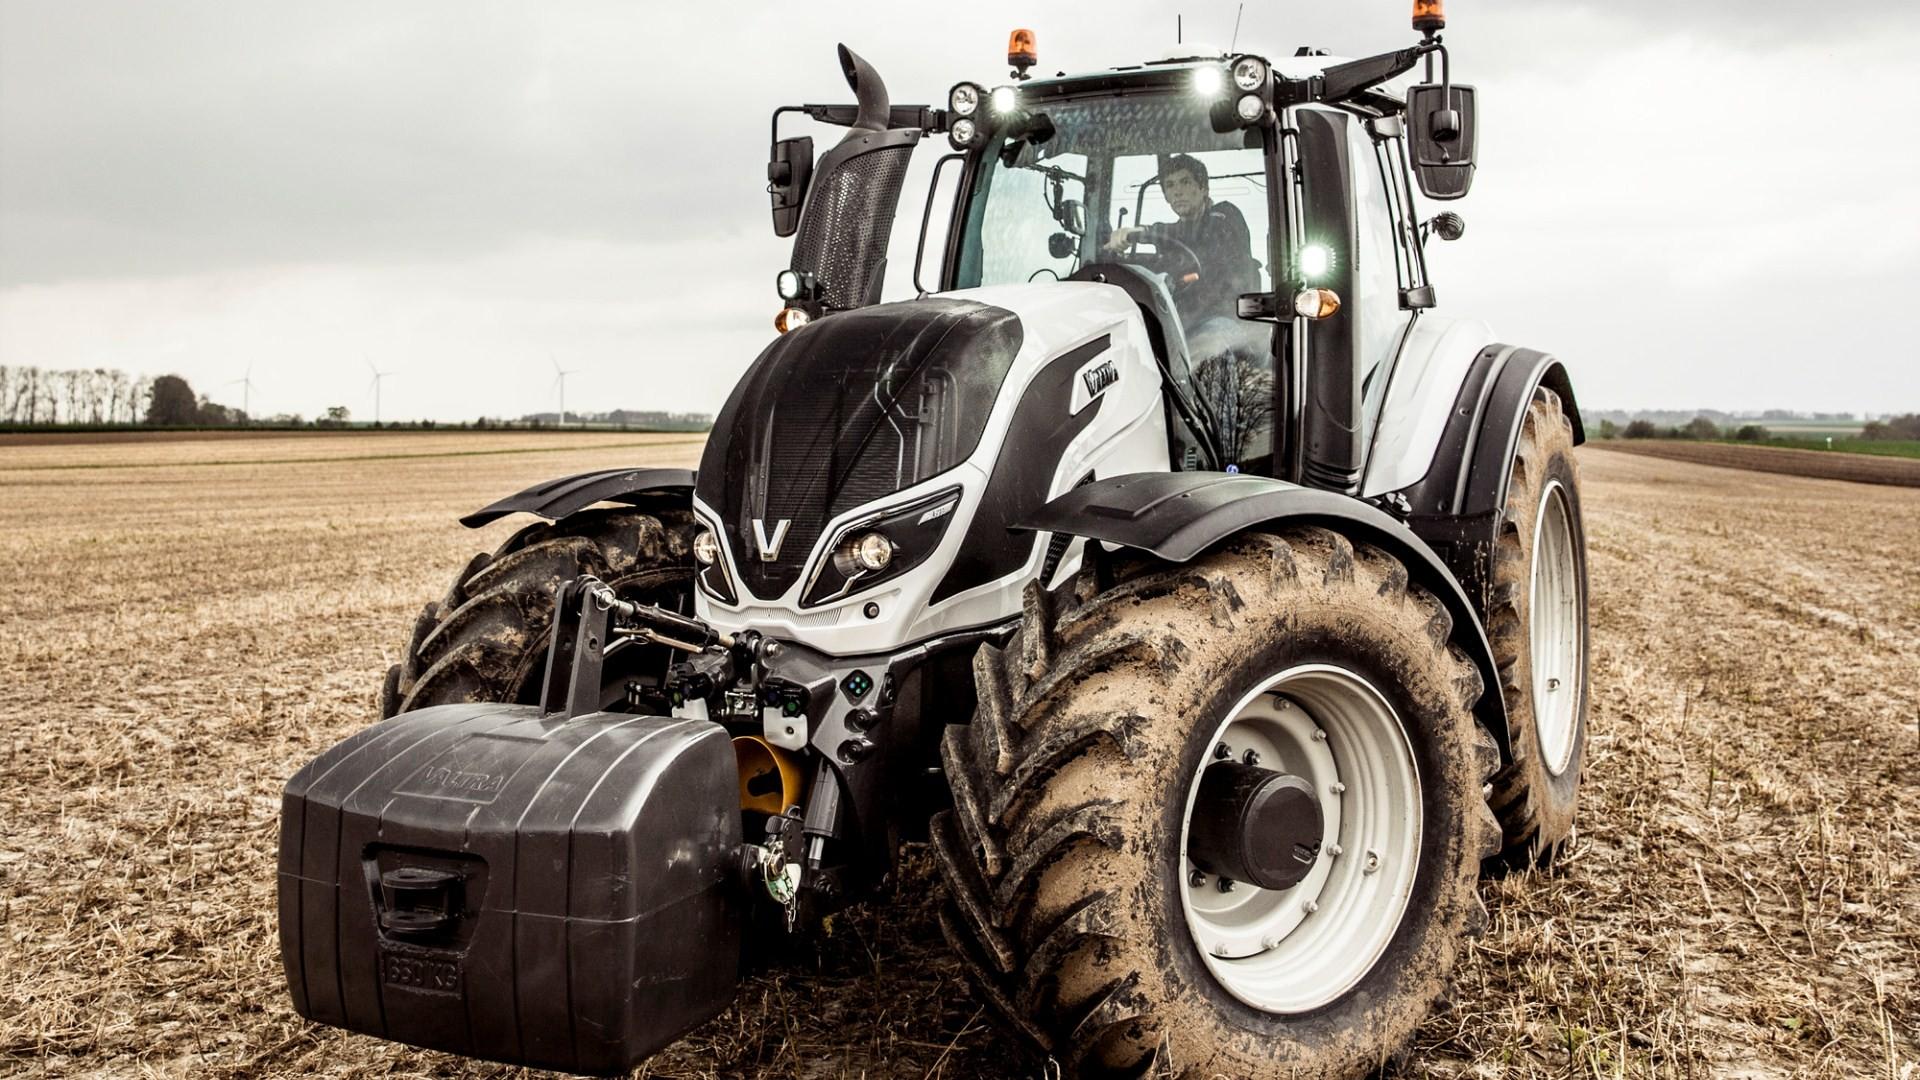 Traktor Wallpaper Hd 71 Images